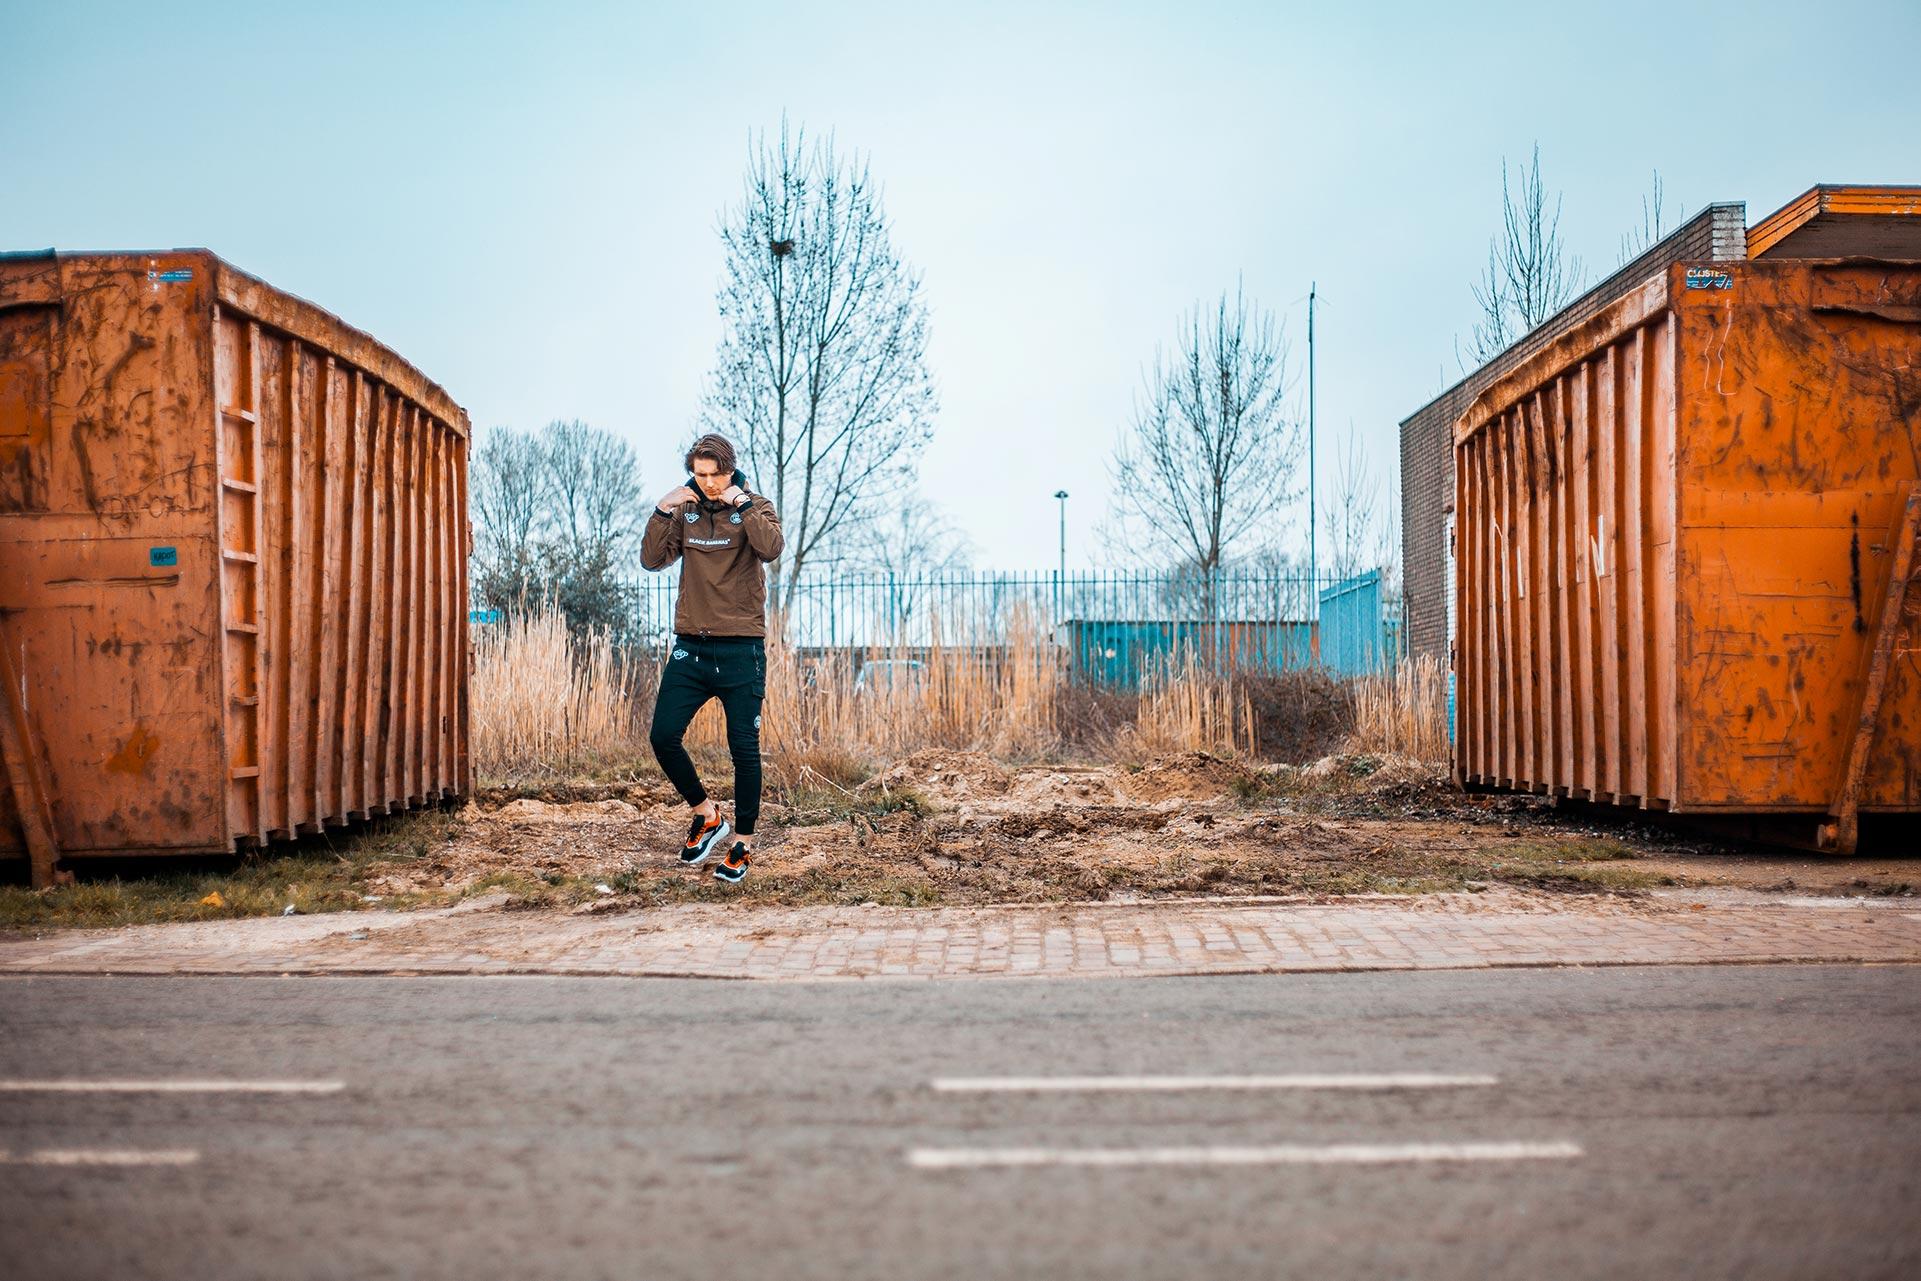 As you were, Nijmegen - Daily Fresh - Fotografie campagne/lookbook